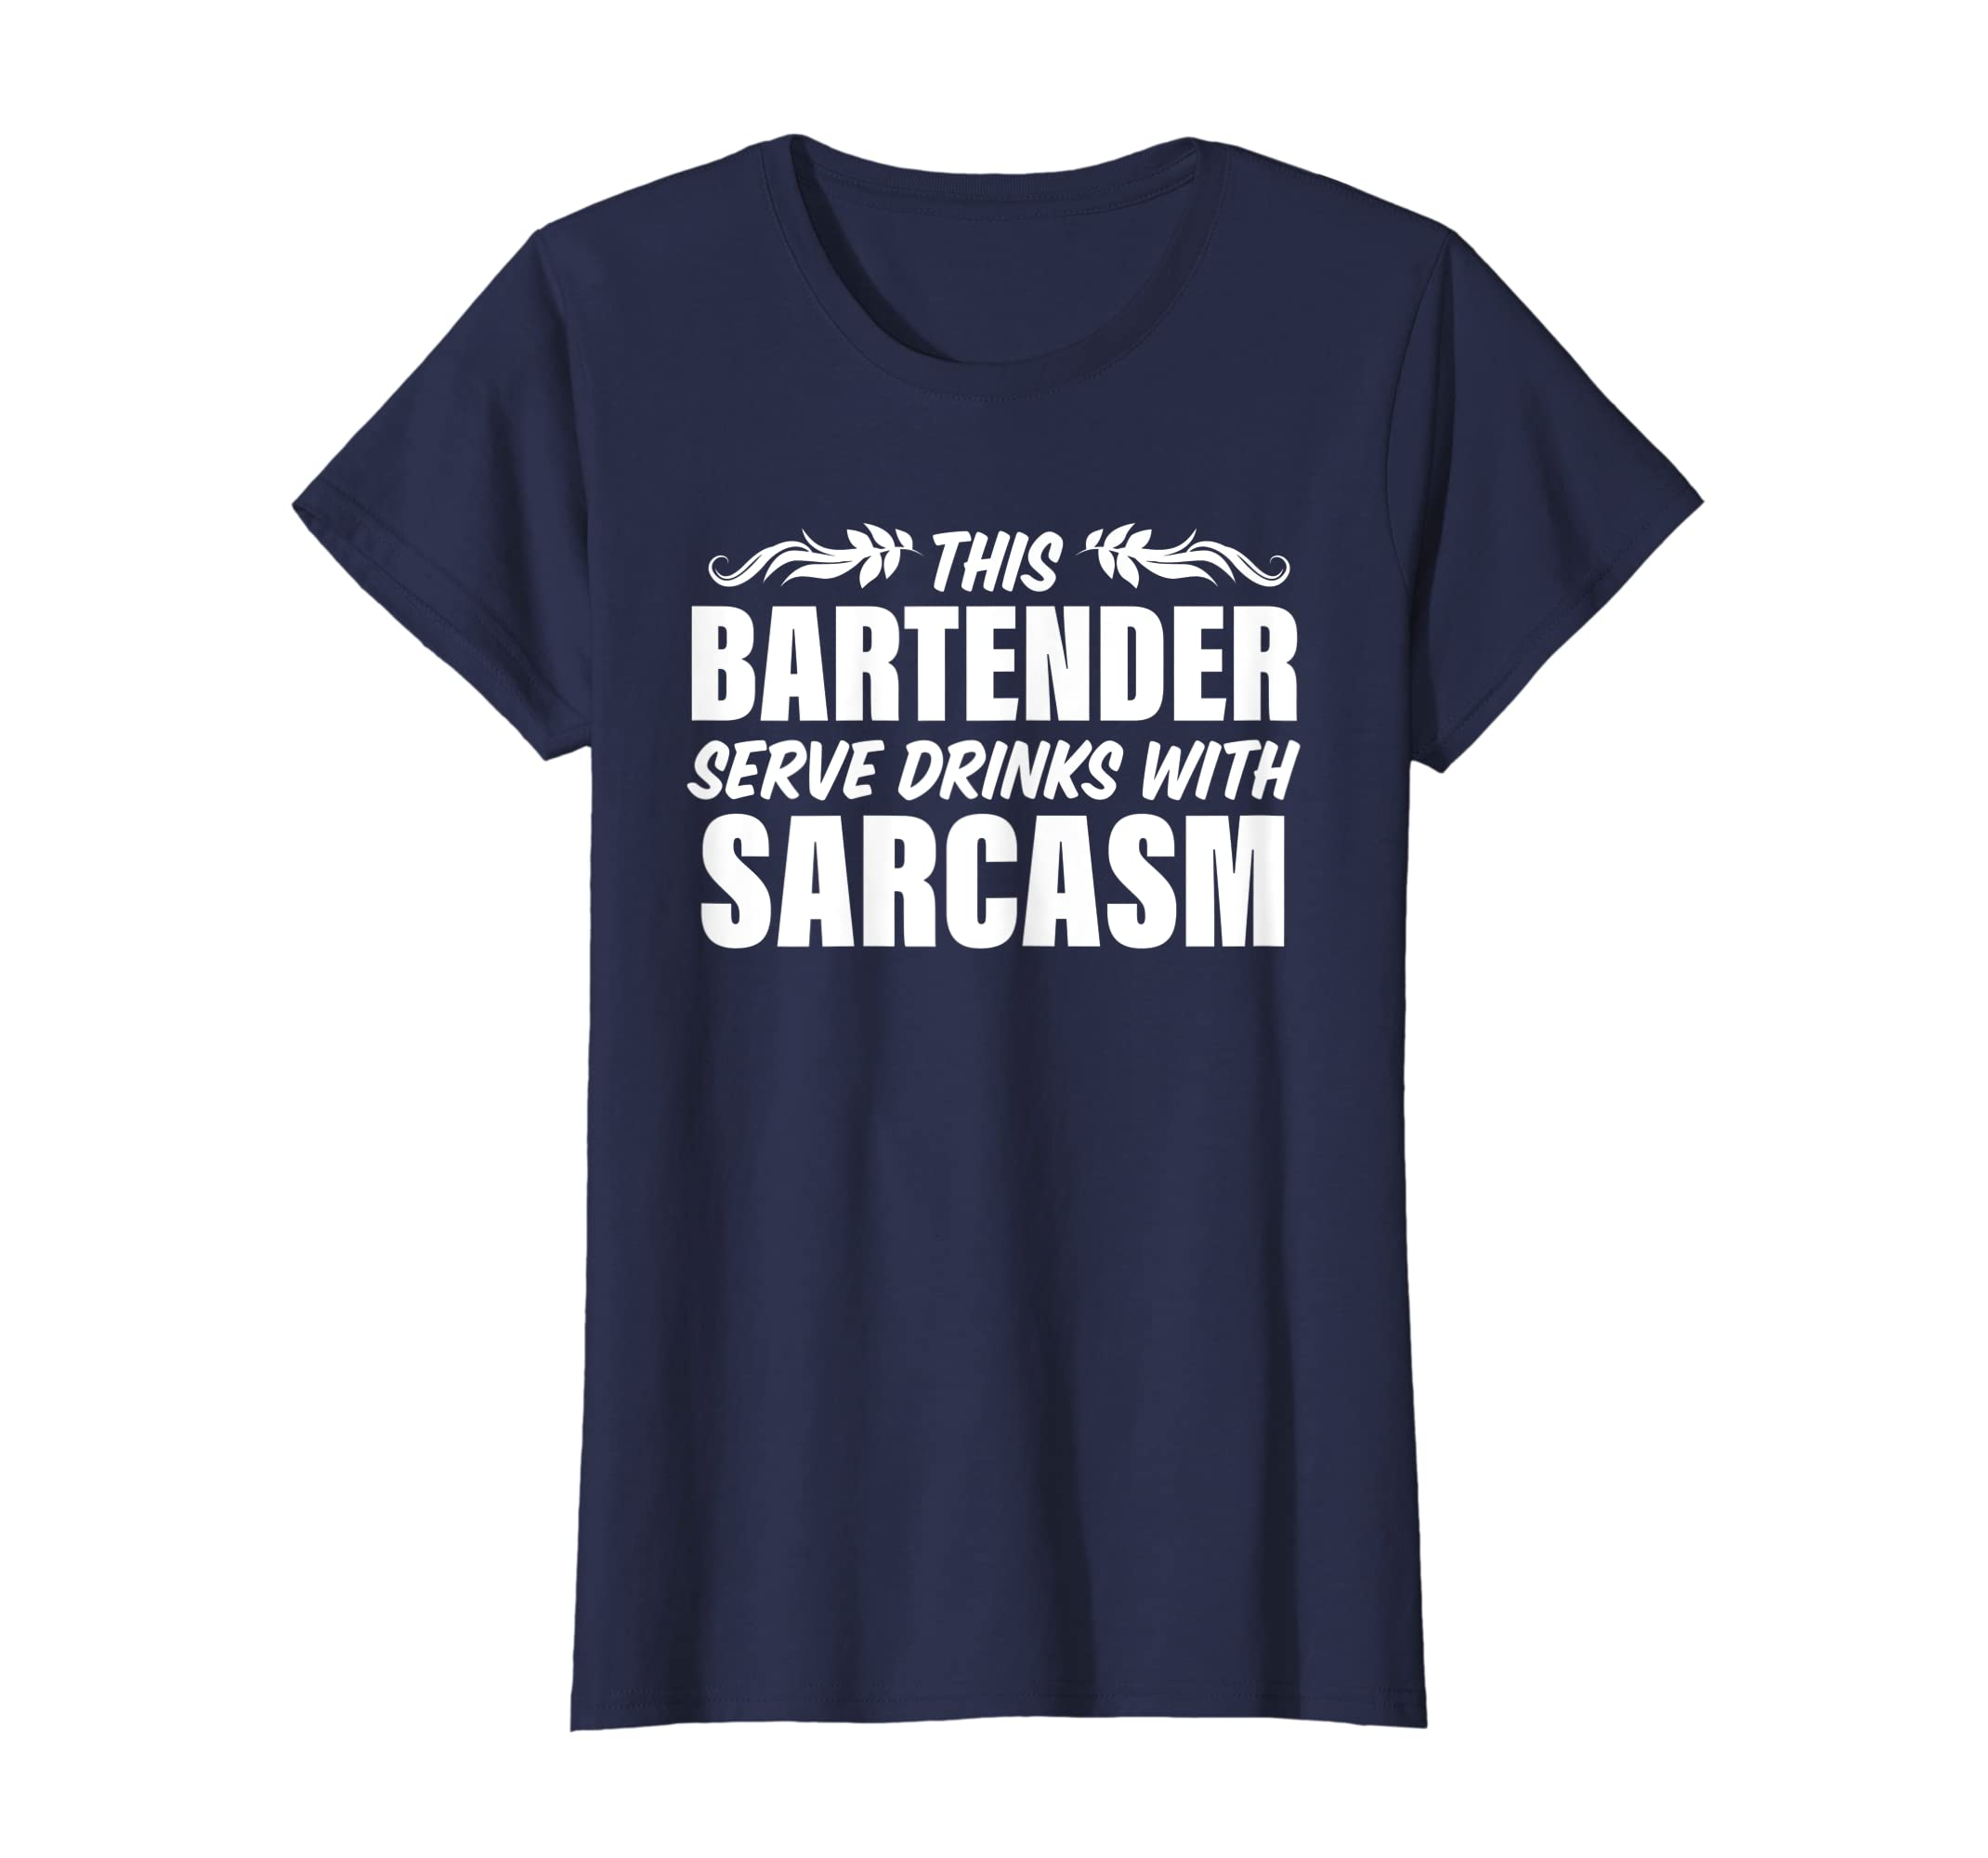 097973c6 Amazon.com: Bartender Funny Shirt Sarcasm Gift Tshirt for Men Women:  Clothing